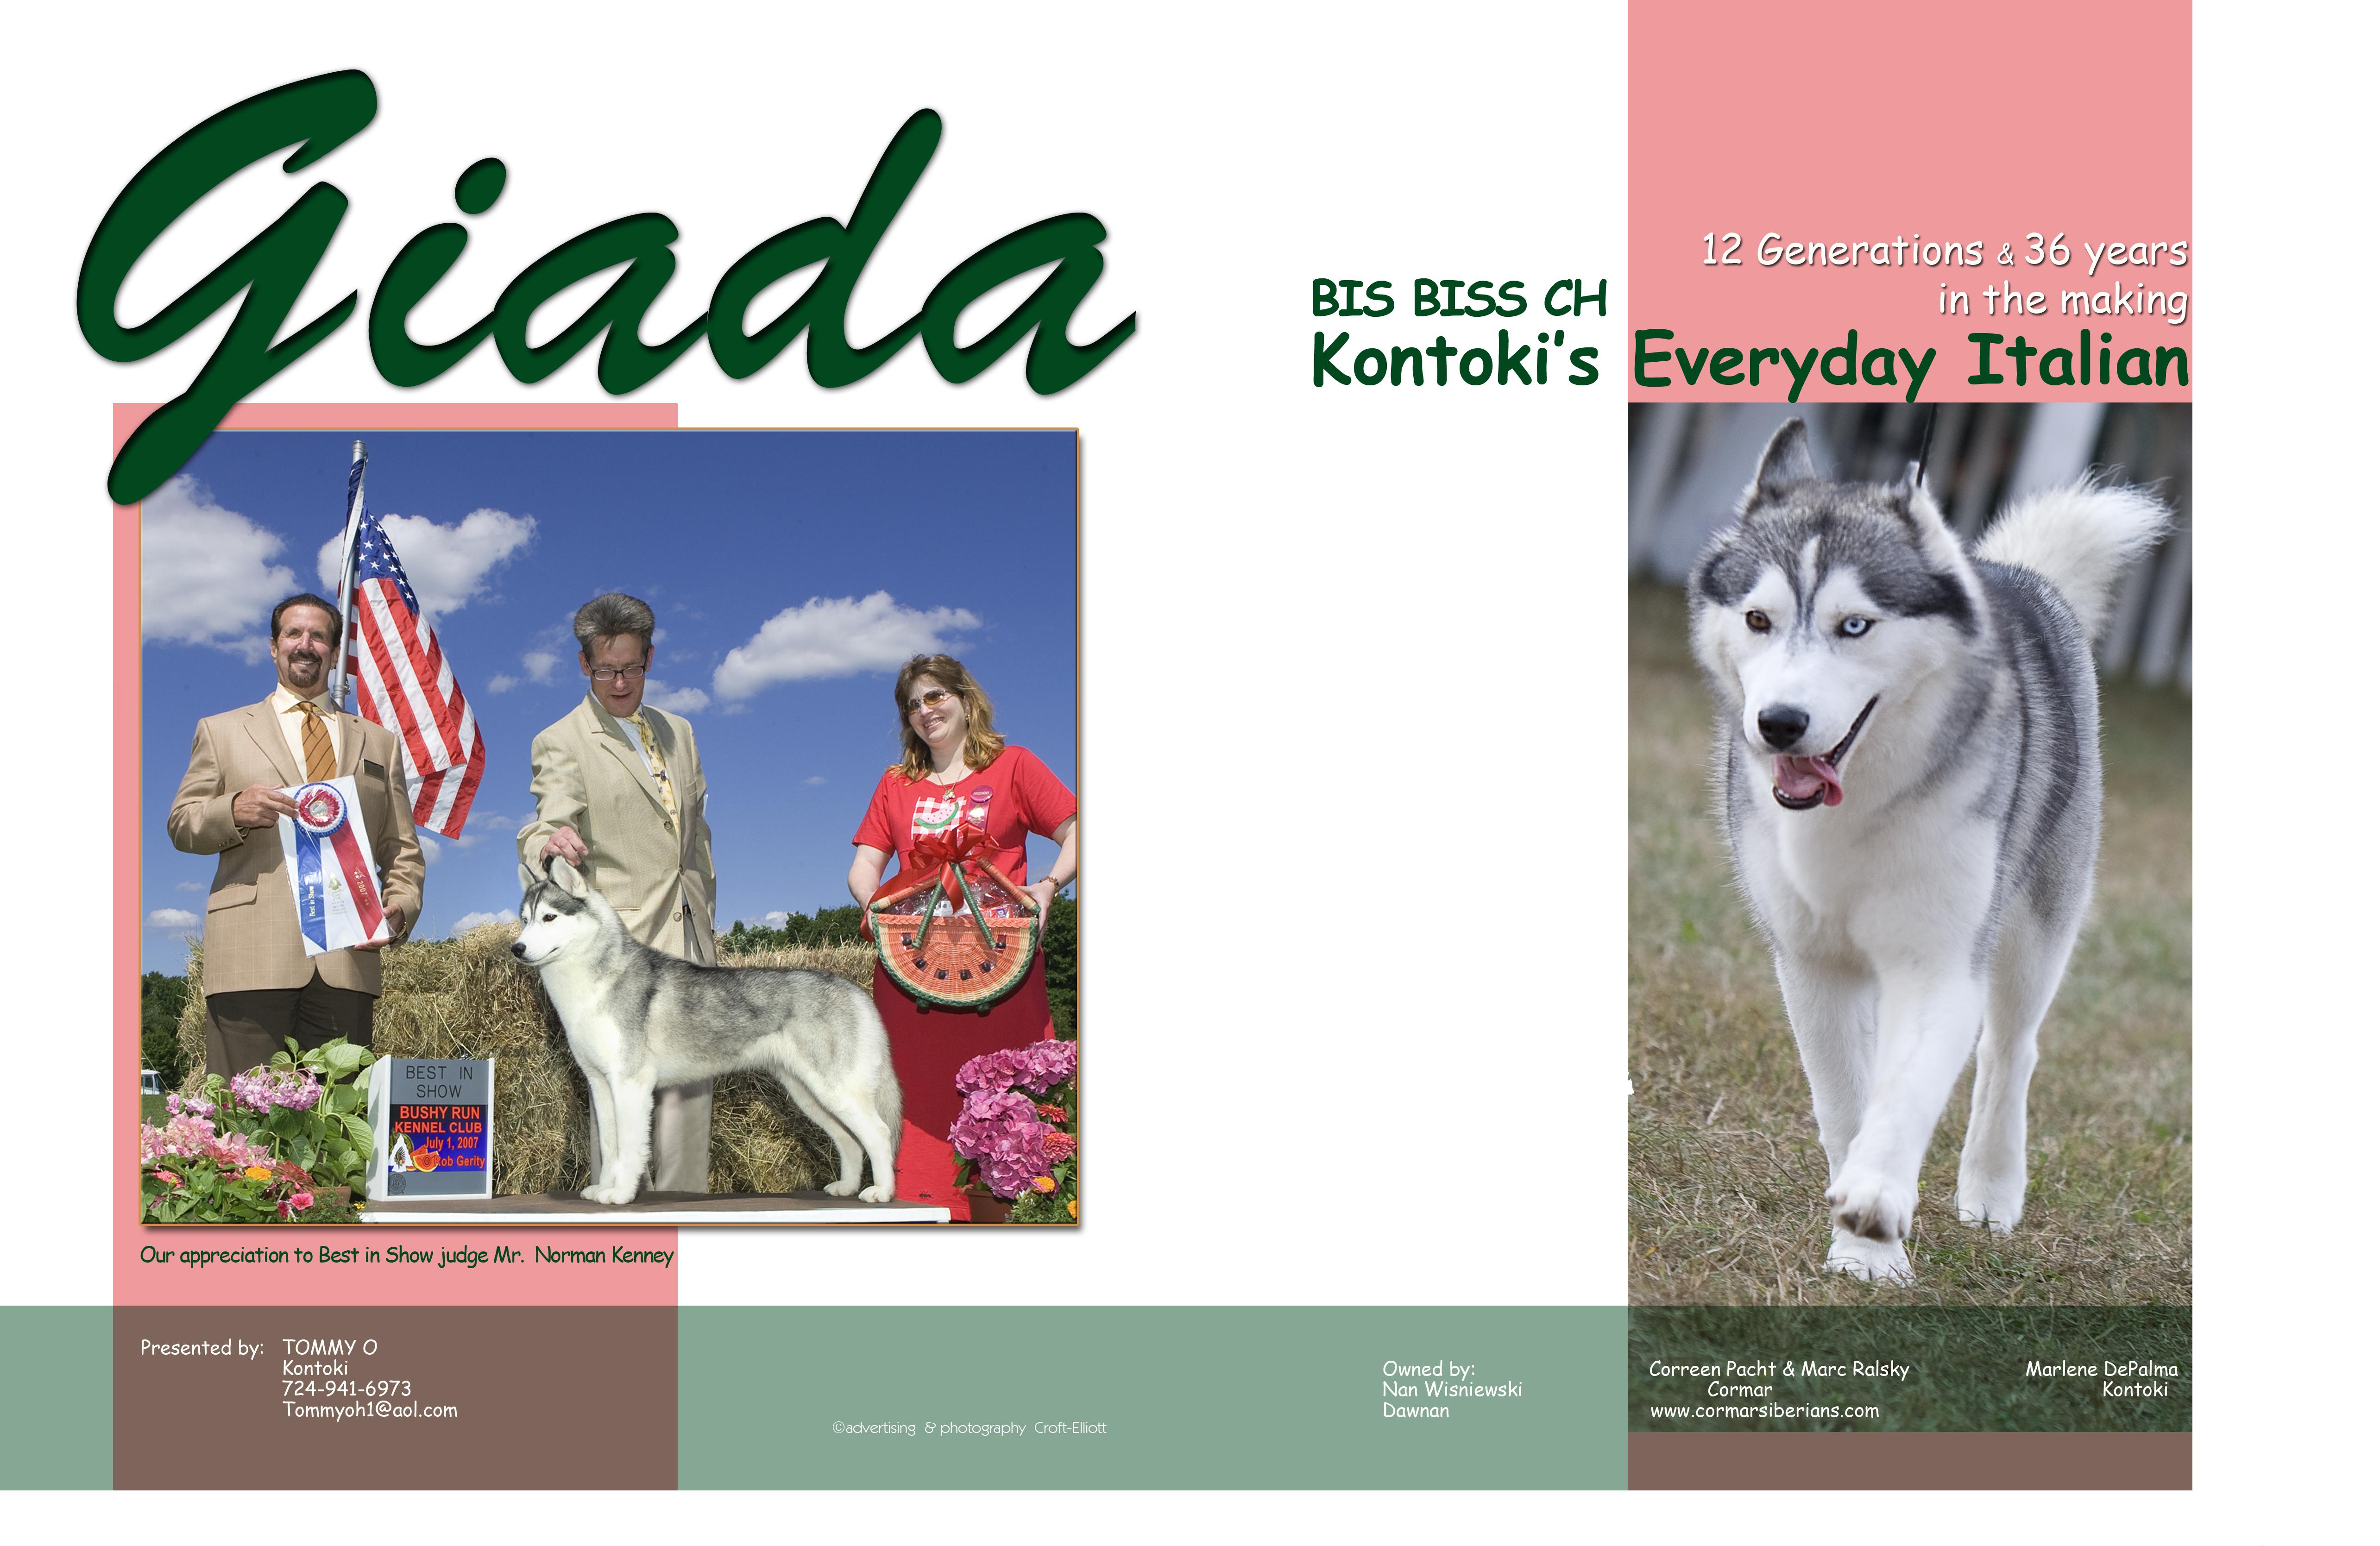 Westminster Dog Show PachtgiadasibeWDD112007ac